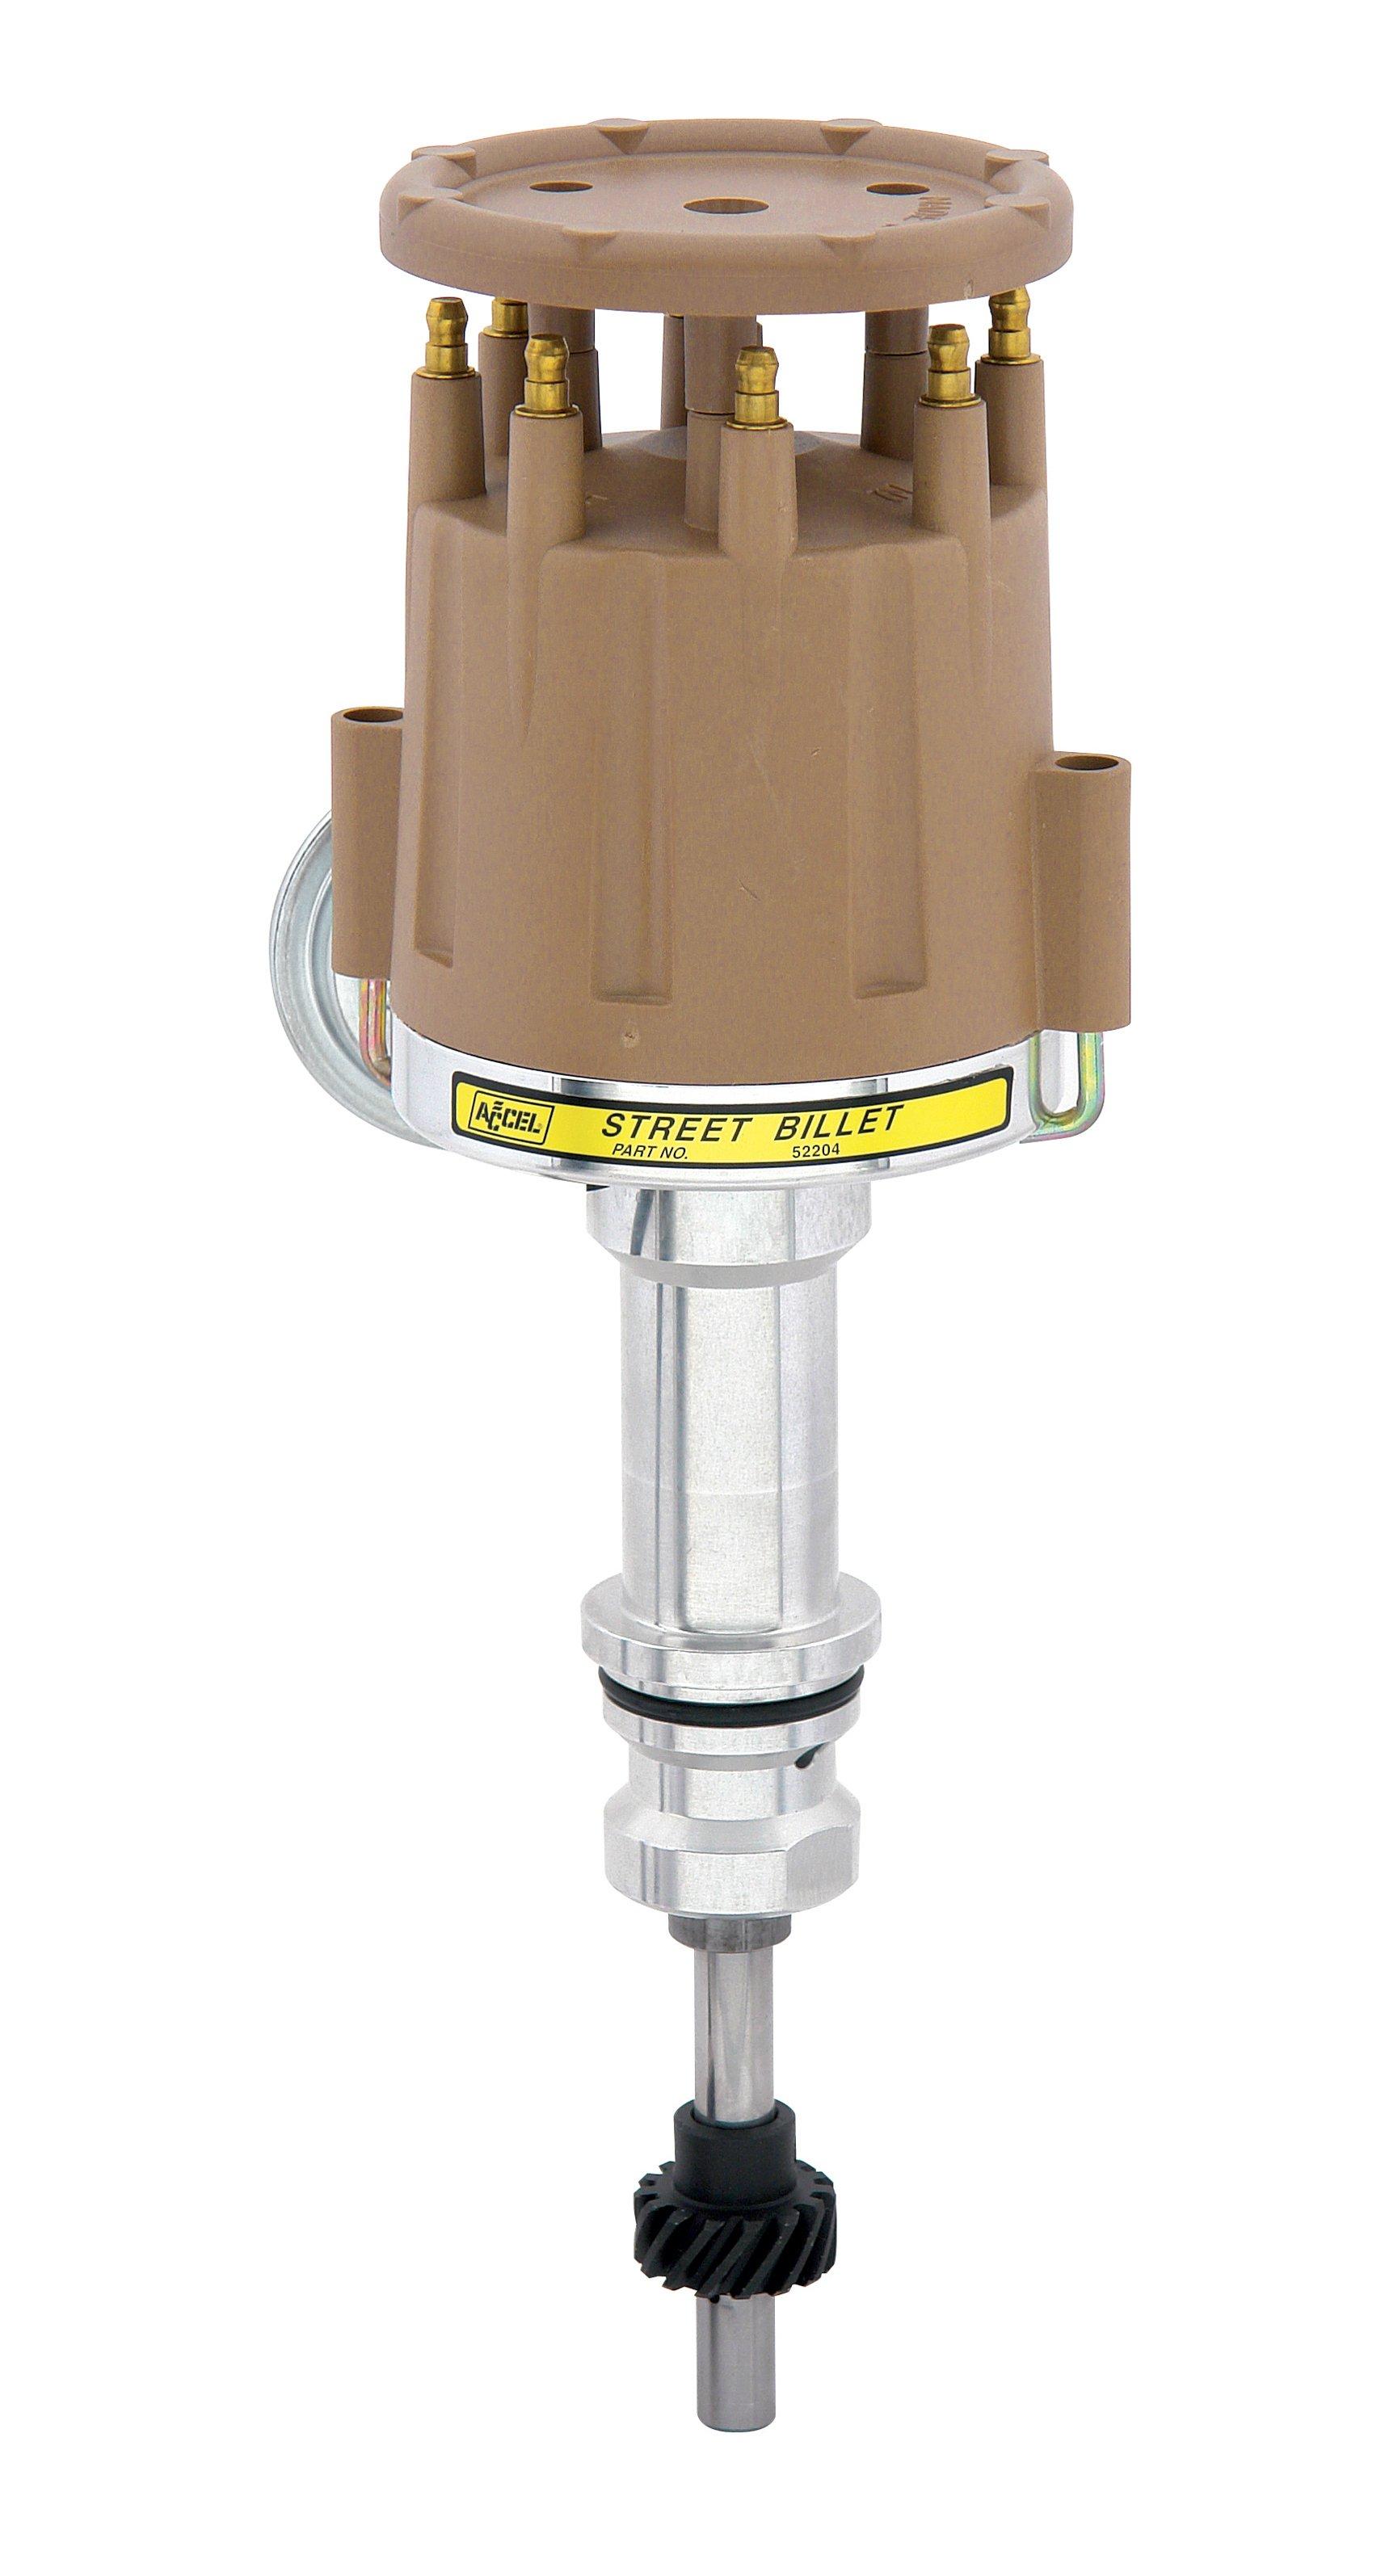 accel hei distributor wiring diagram 49cc engine parts street billet 46